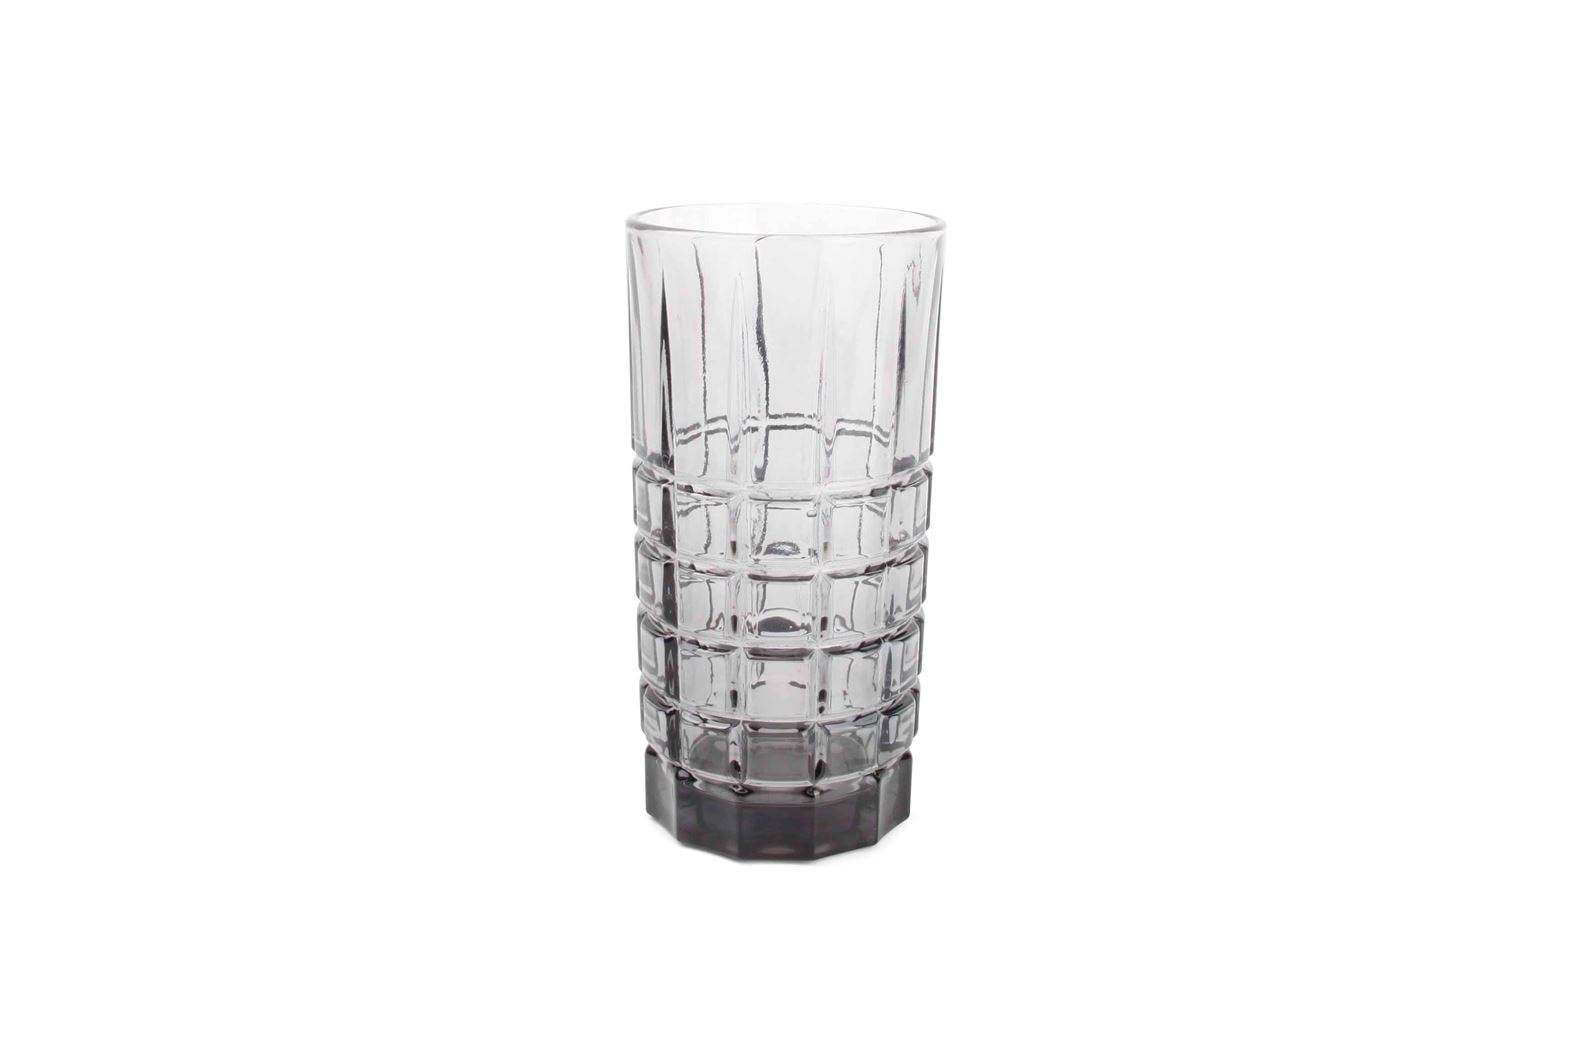 longdrinkglas vierkant grijs victoria (4sts)